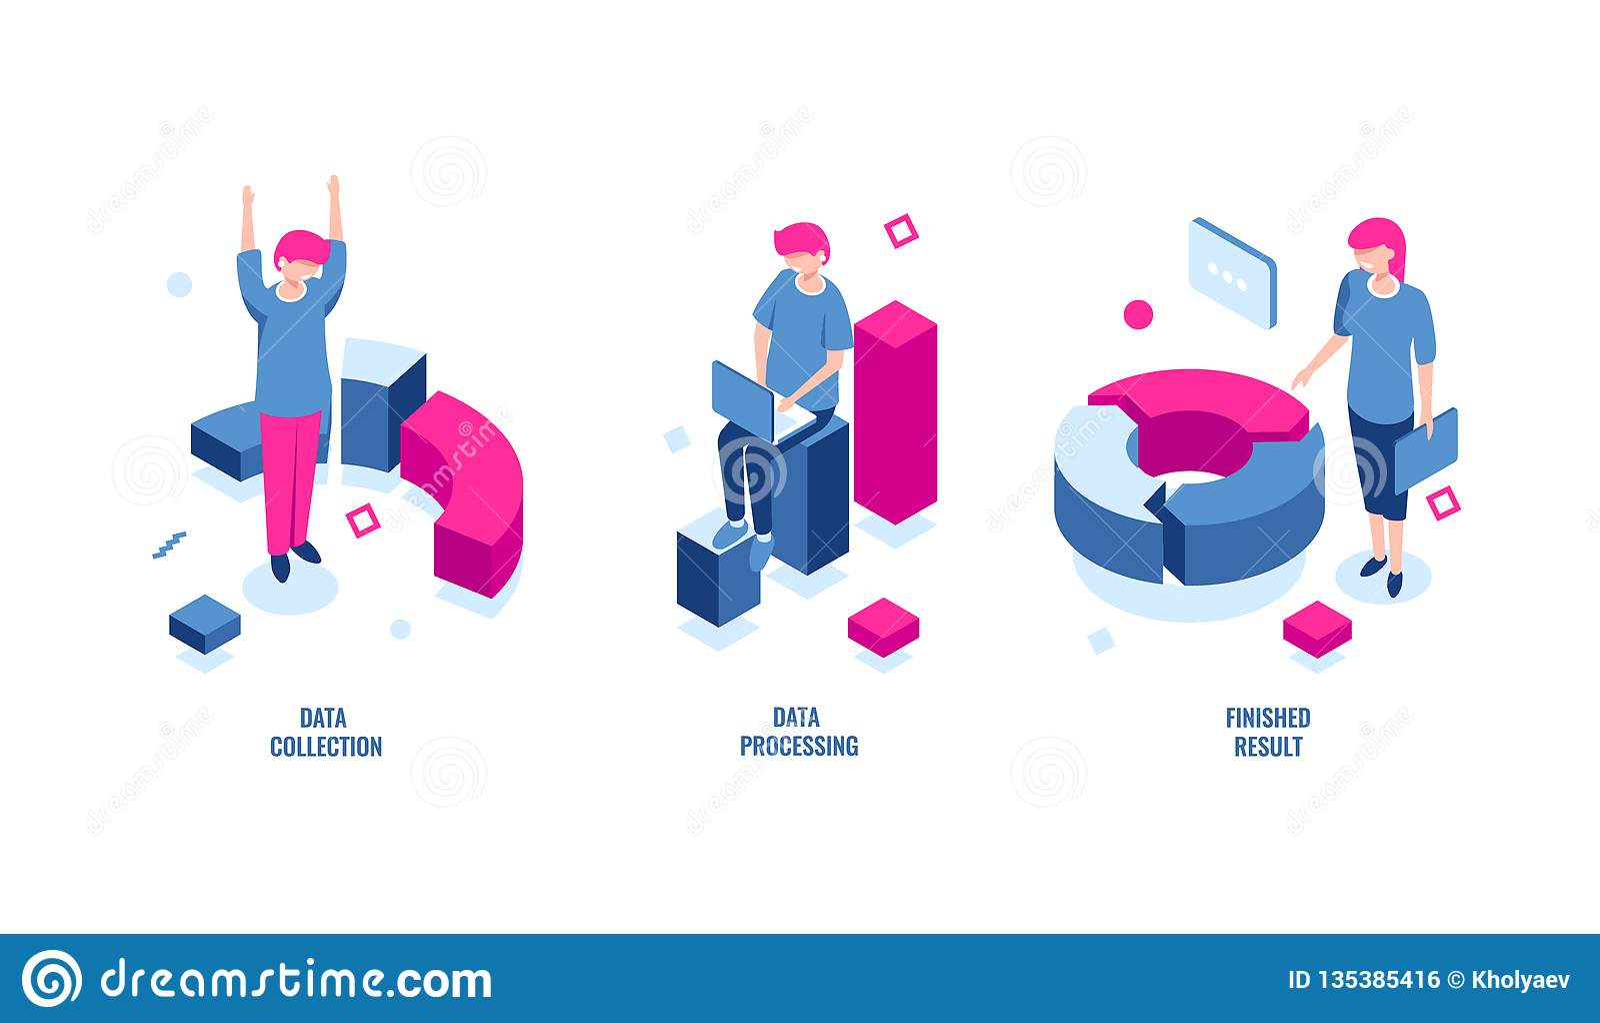 Estatísticas de negócio, levantamento de dados e ícone isométrico de processo de dados, resultado terminado, diagrama de carta, r